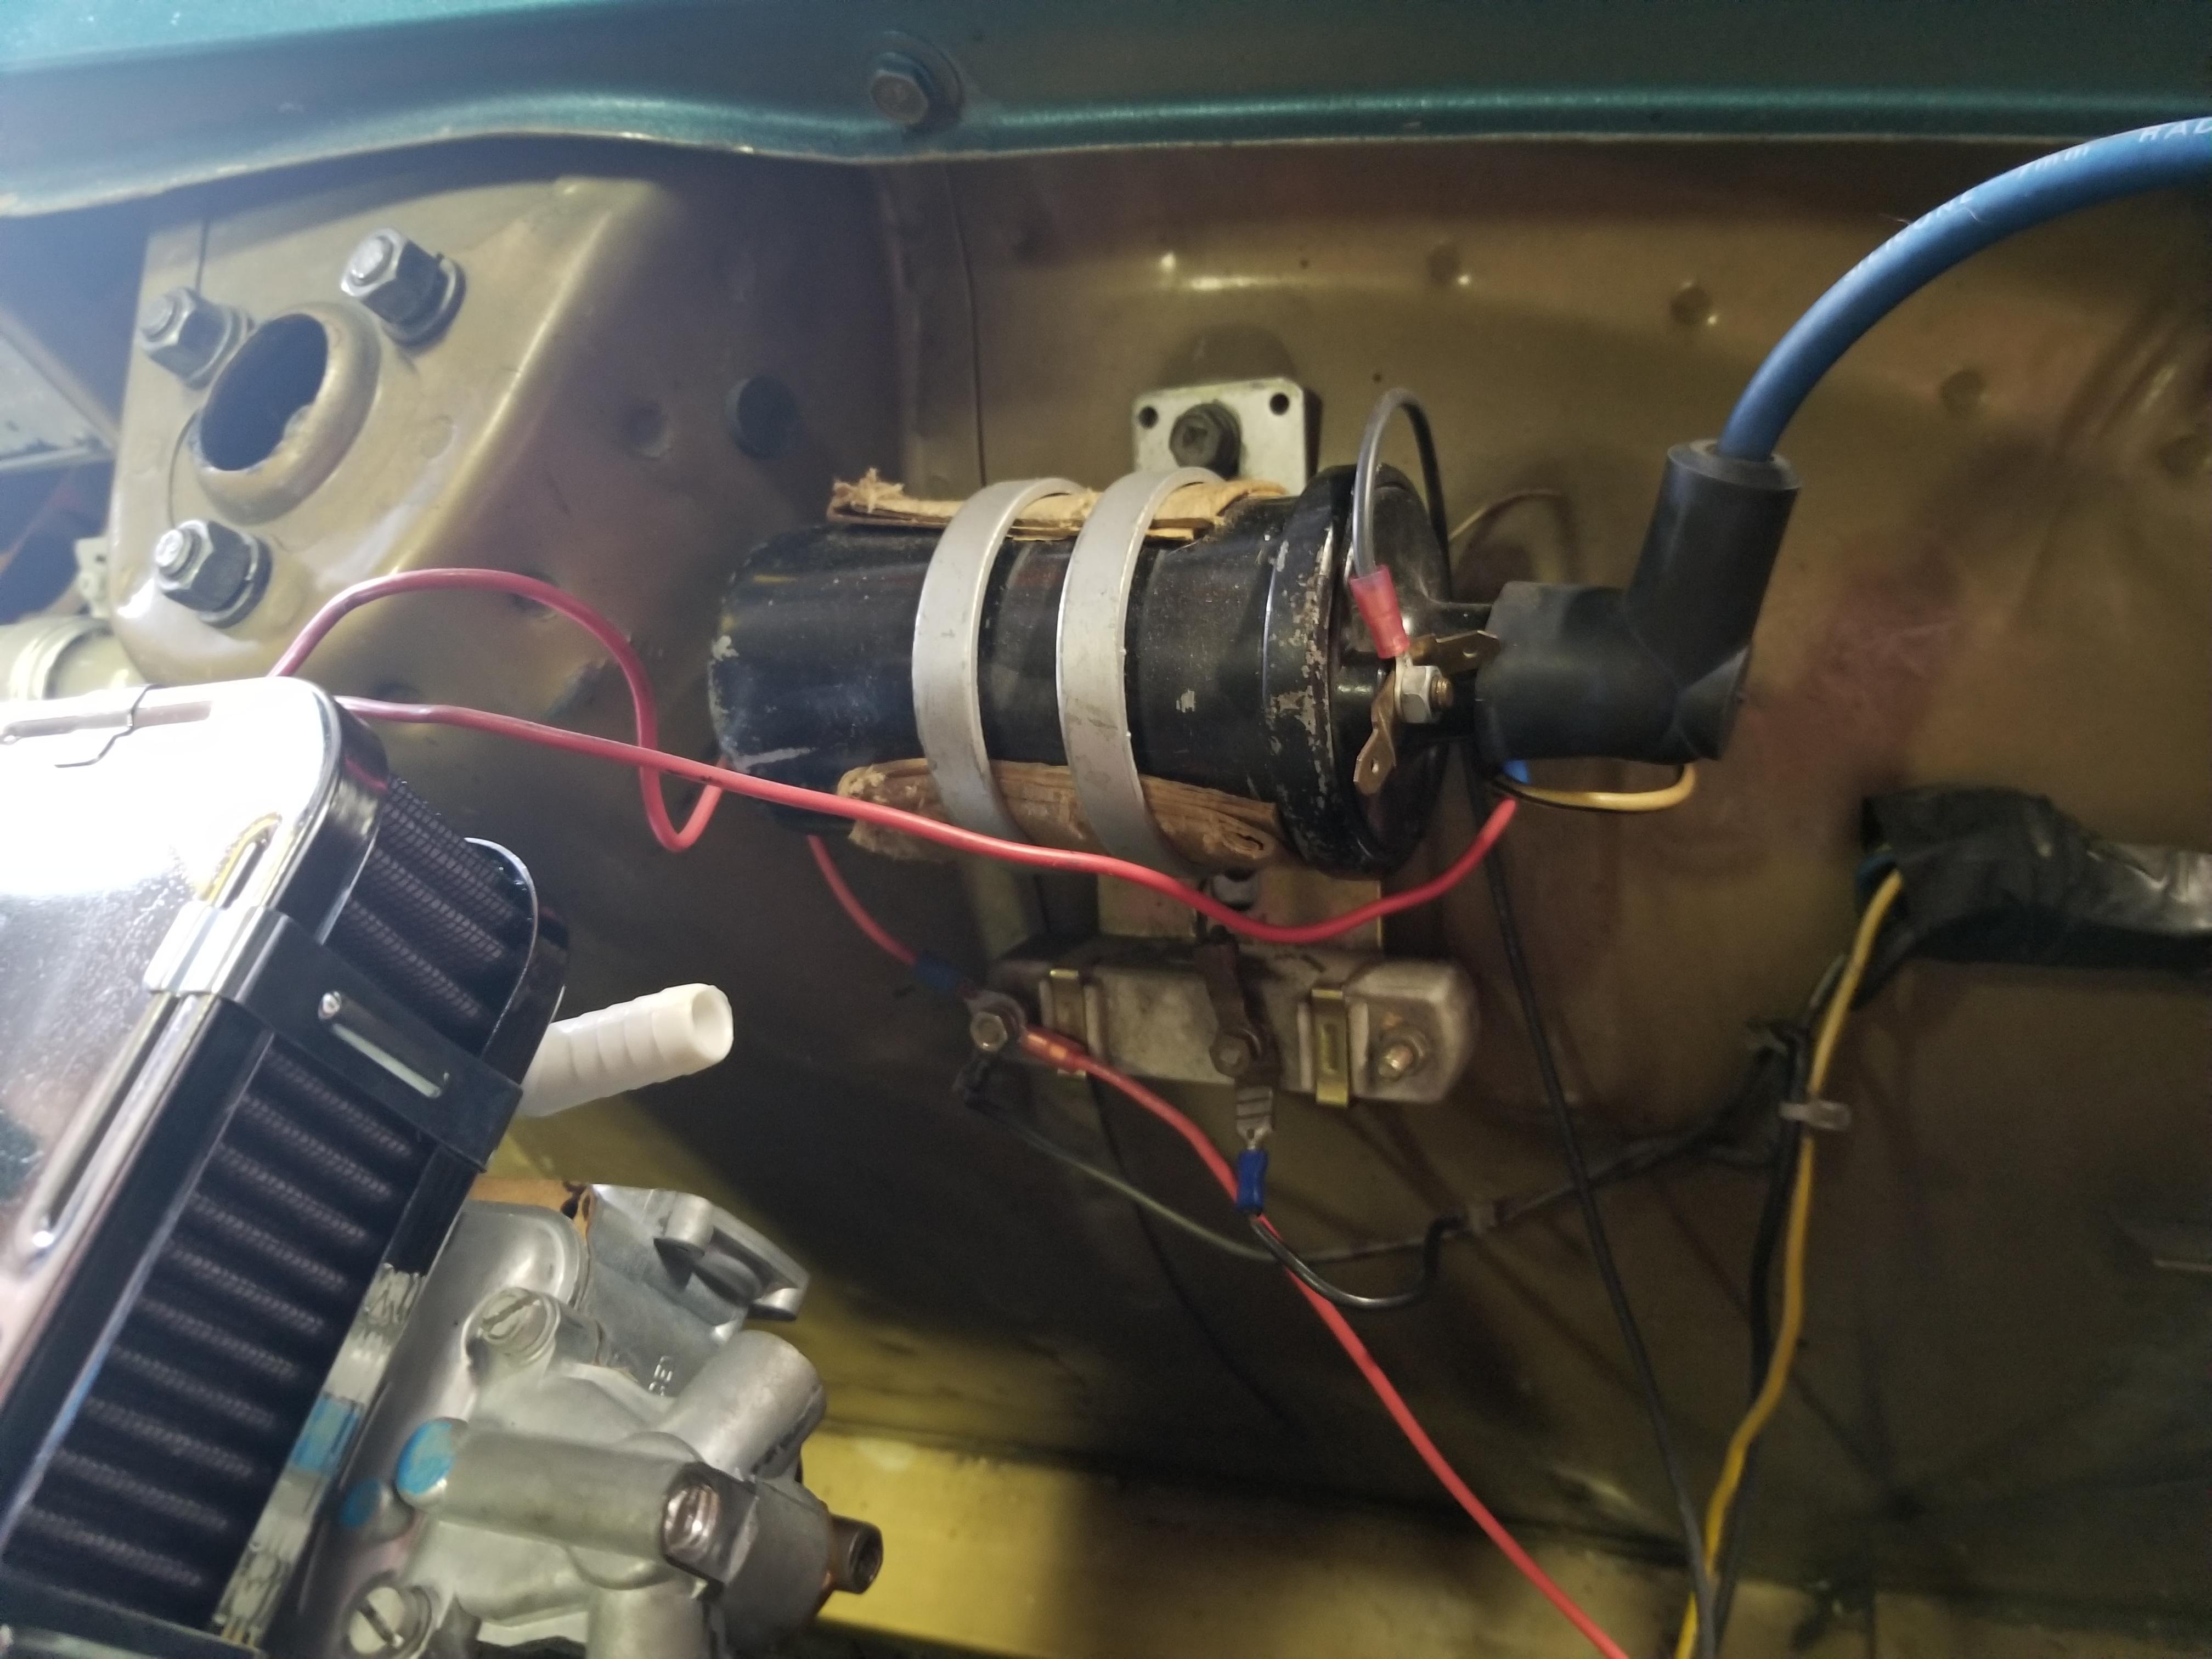 260z Wiring Diagram Additionally On 74 Nissan 260z Wiring Diagram